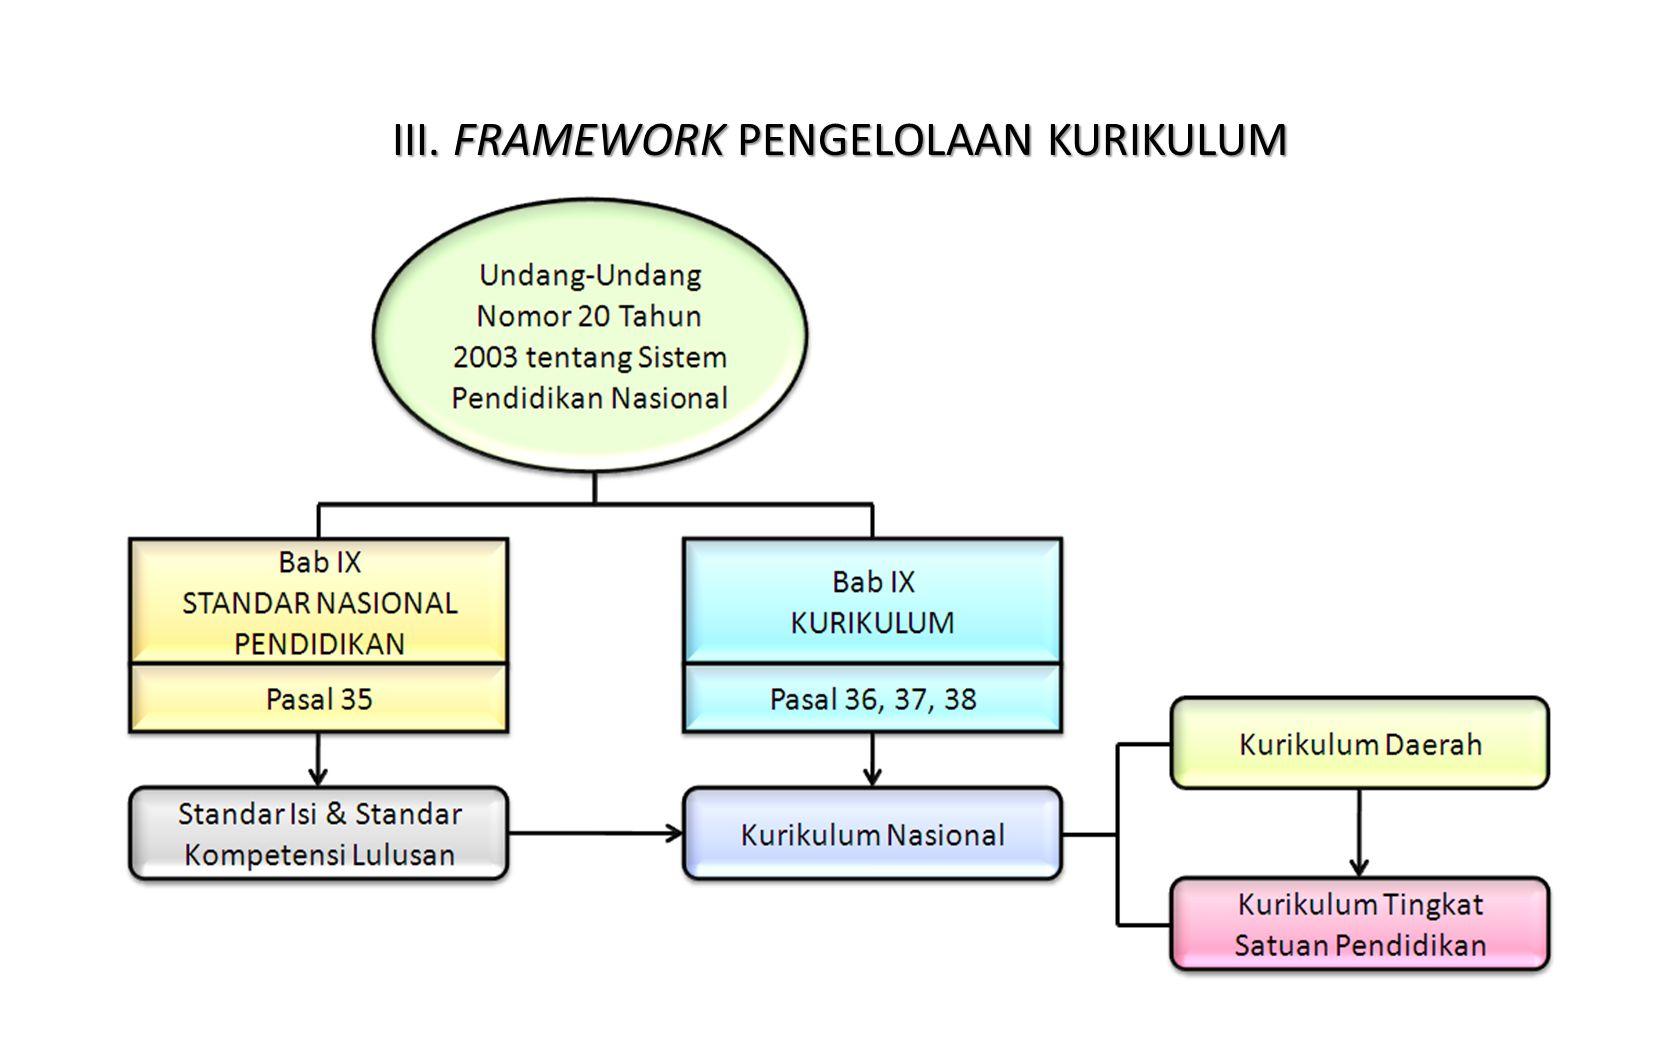 III. FRAMEWORK PENGELOLAAN KURIKULUM